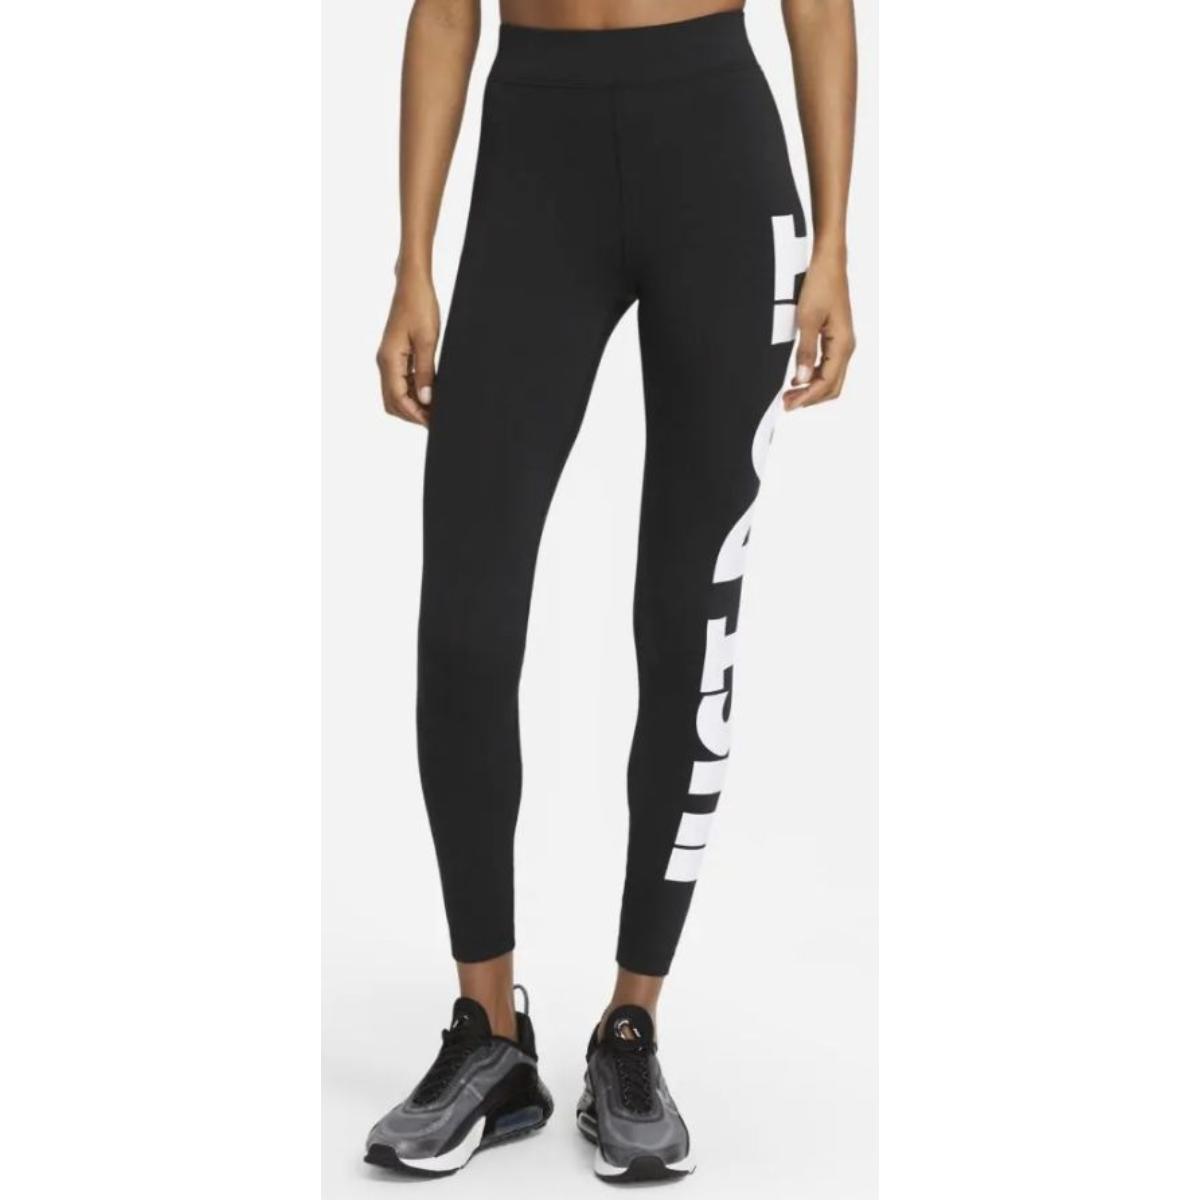 Calça Feminina Nike Cz8534-010 Sportwear Preto/branco